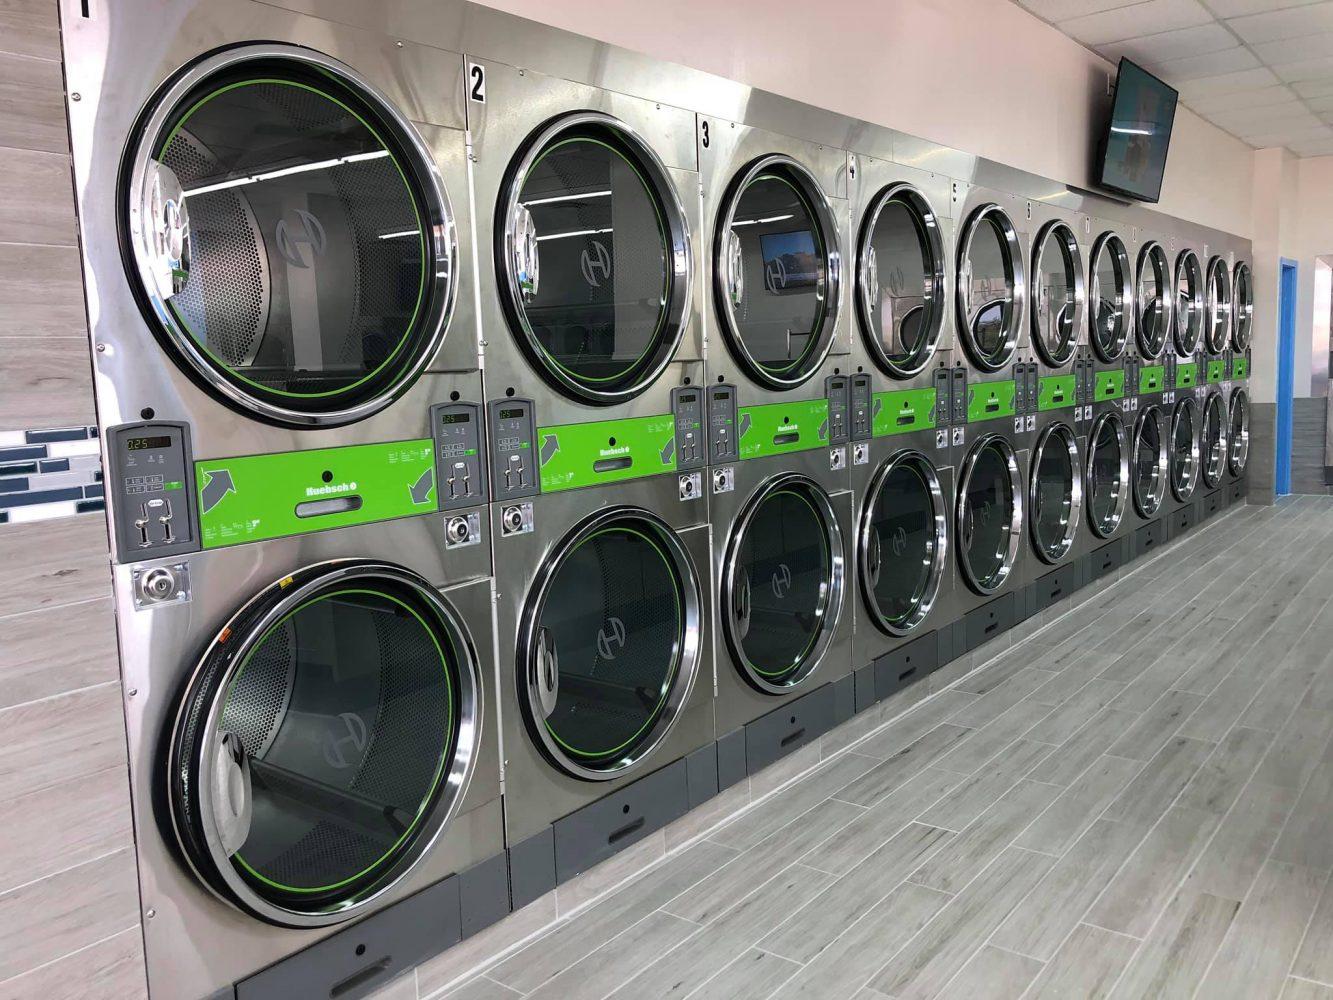 dallas laundromat laundry equipment